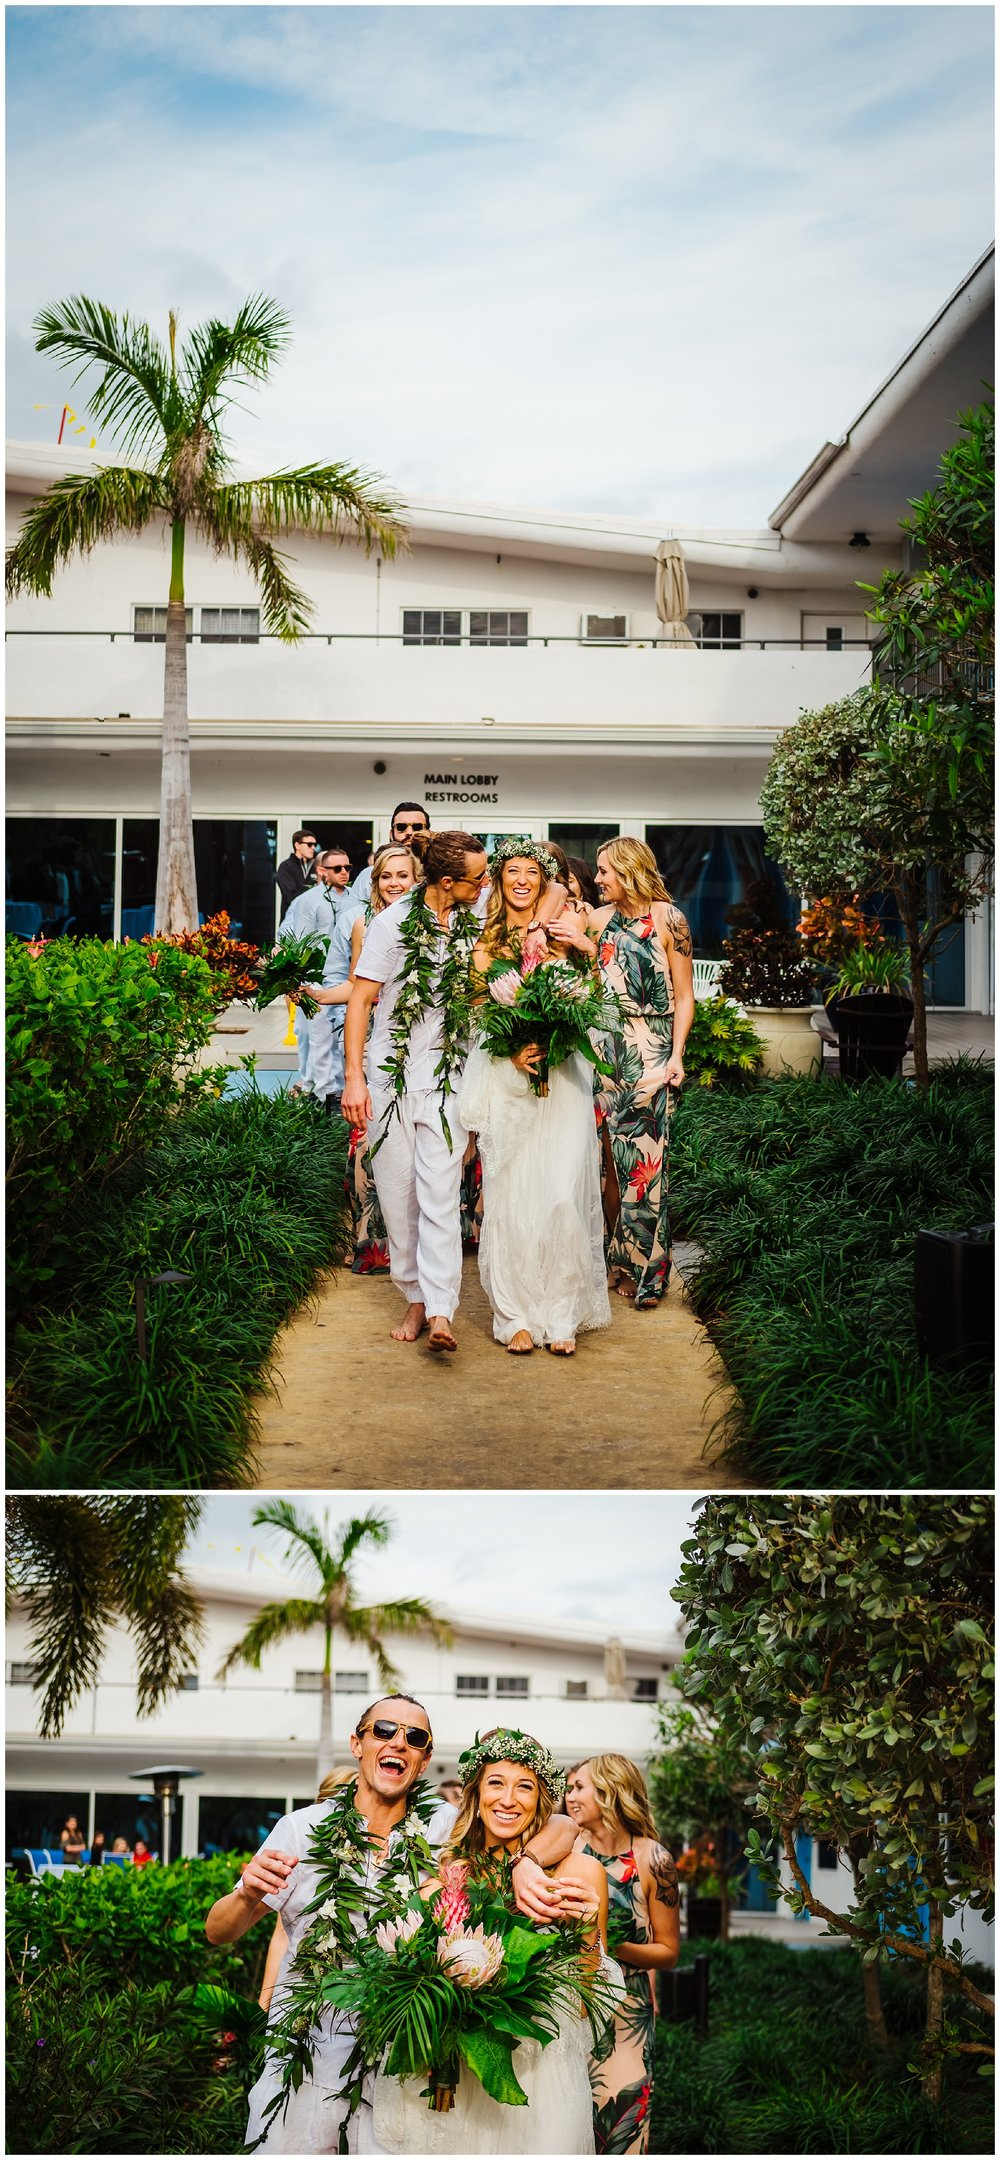 tampa-bay-wedding-photographer-barefoot-post-card-inn-tropical-hawaiin-lei-pink-pineapples-flower-crown_0148.jpg